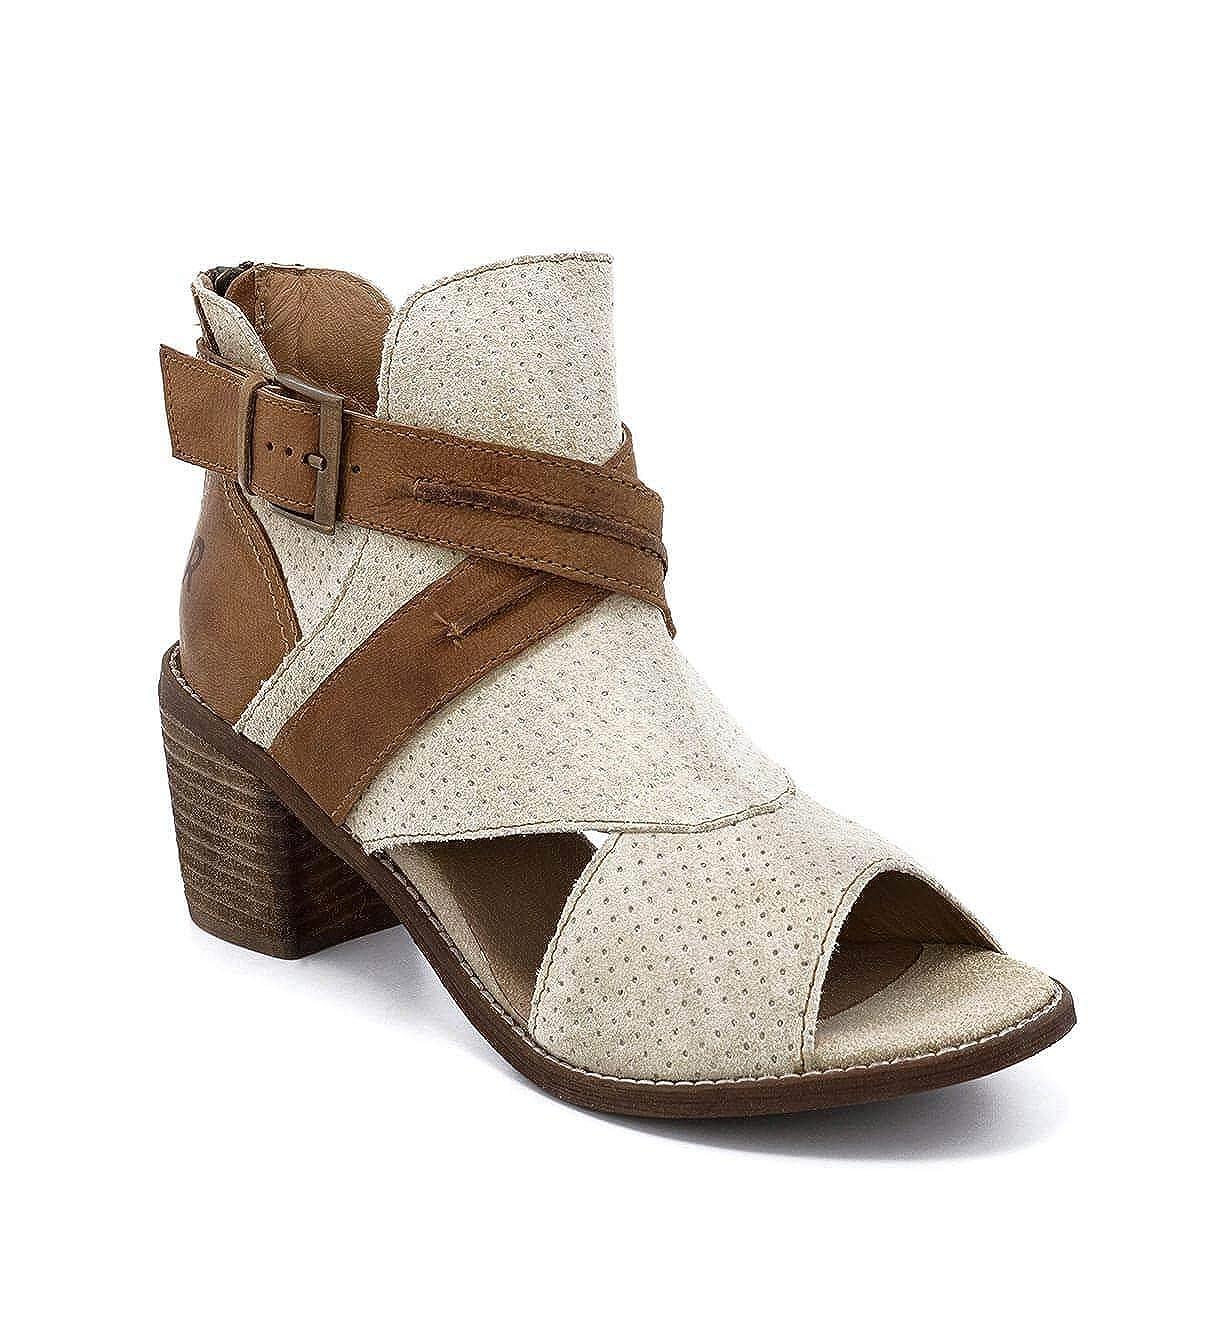 Natalie Leather Wedge, Beige, Size 6.0